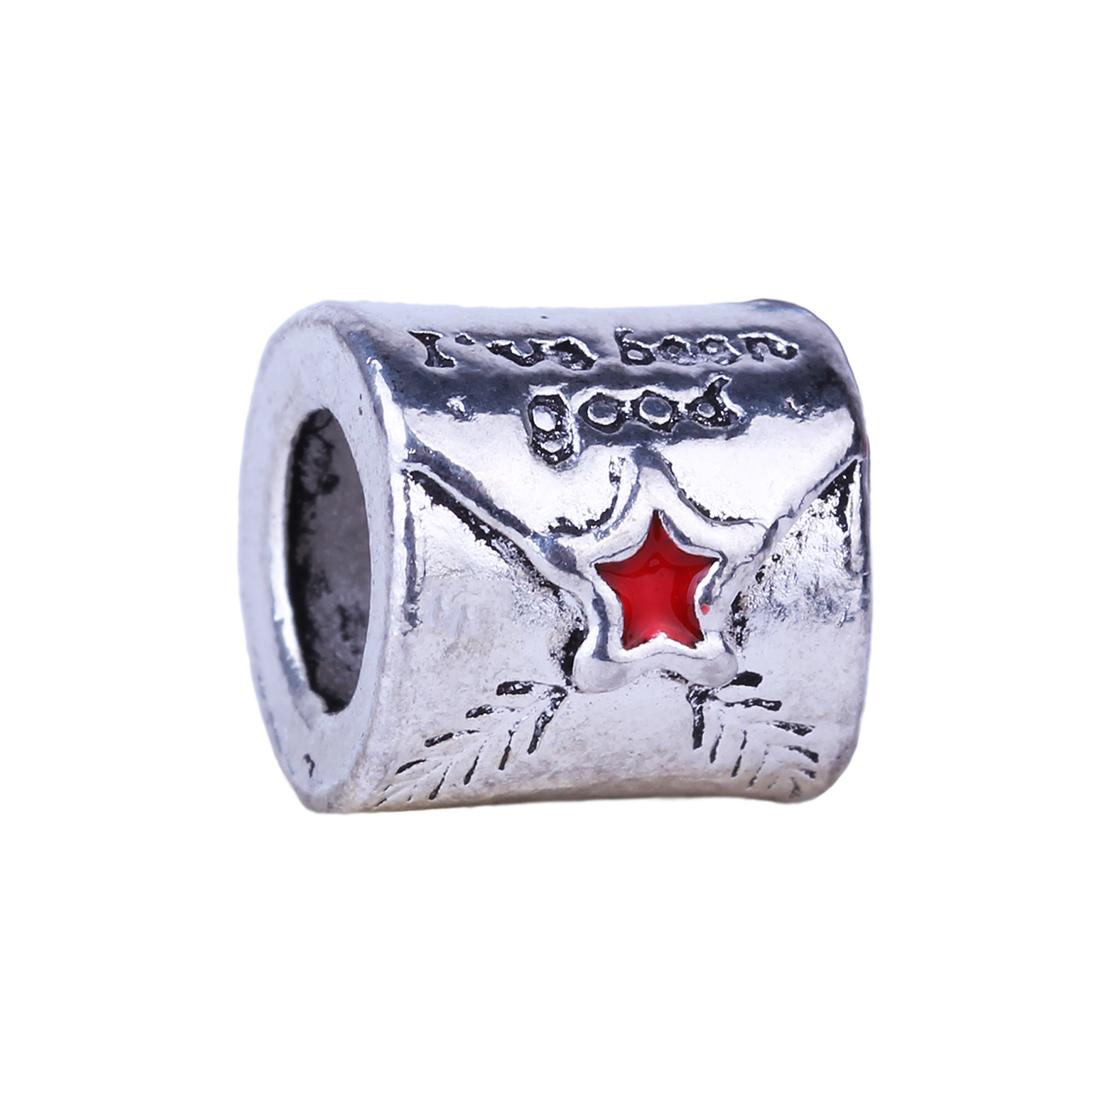 1Piece Mail Envelope European Charms Silver Beads Alloy Bead Fit Pandora BIAGI Bracelets Bangles(China (Mainland))